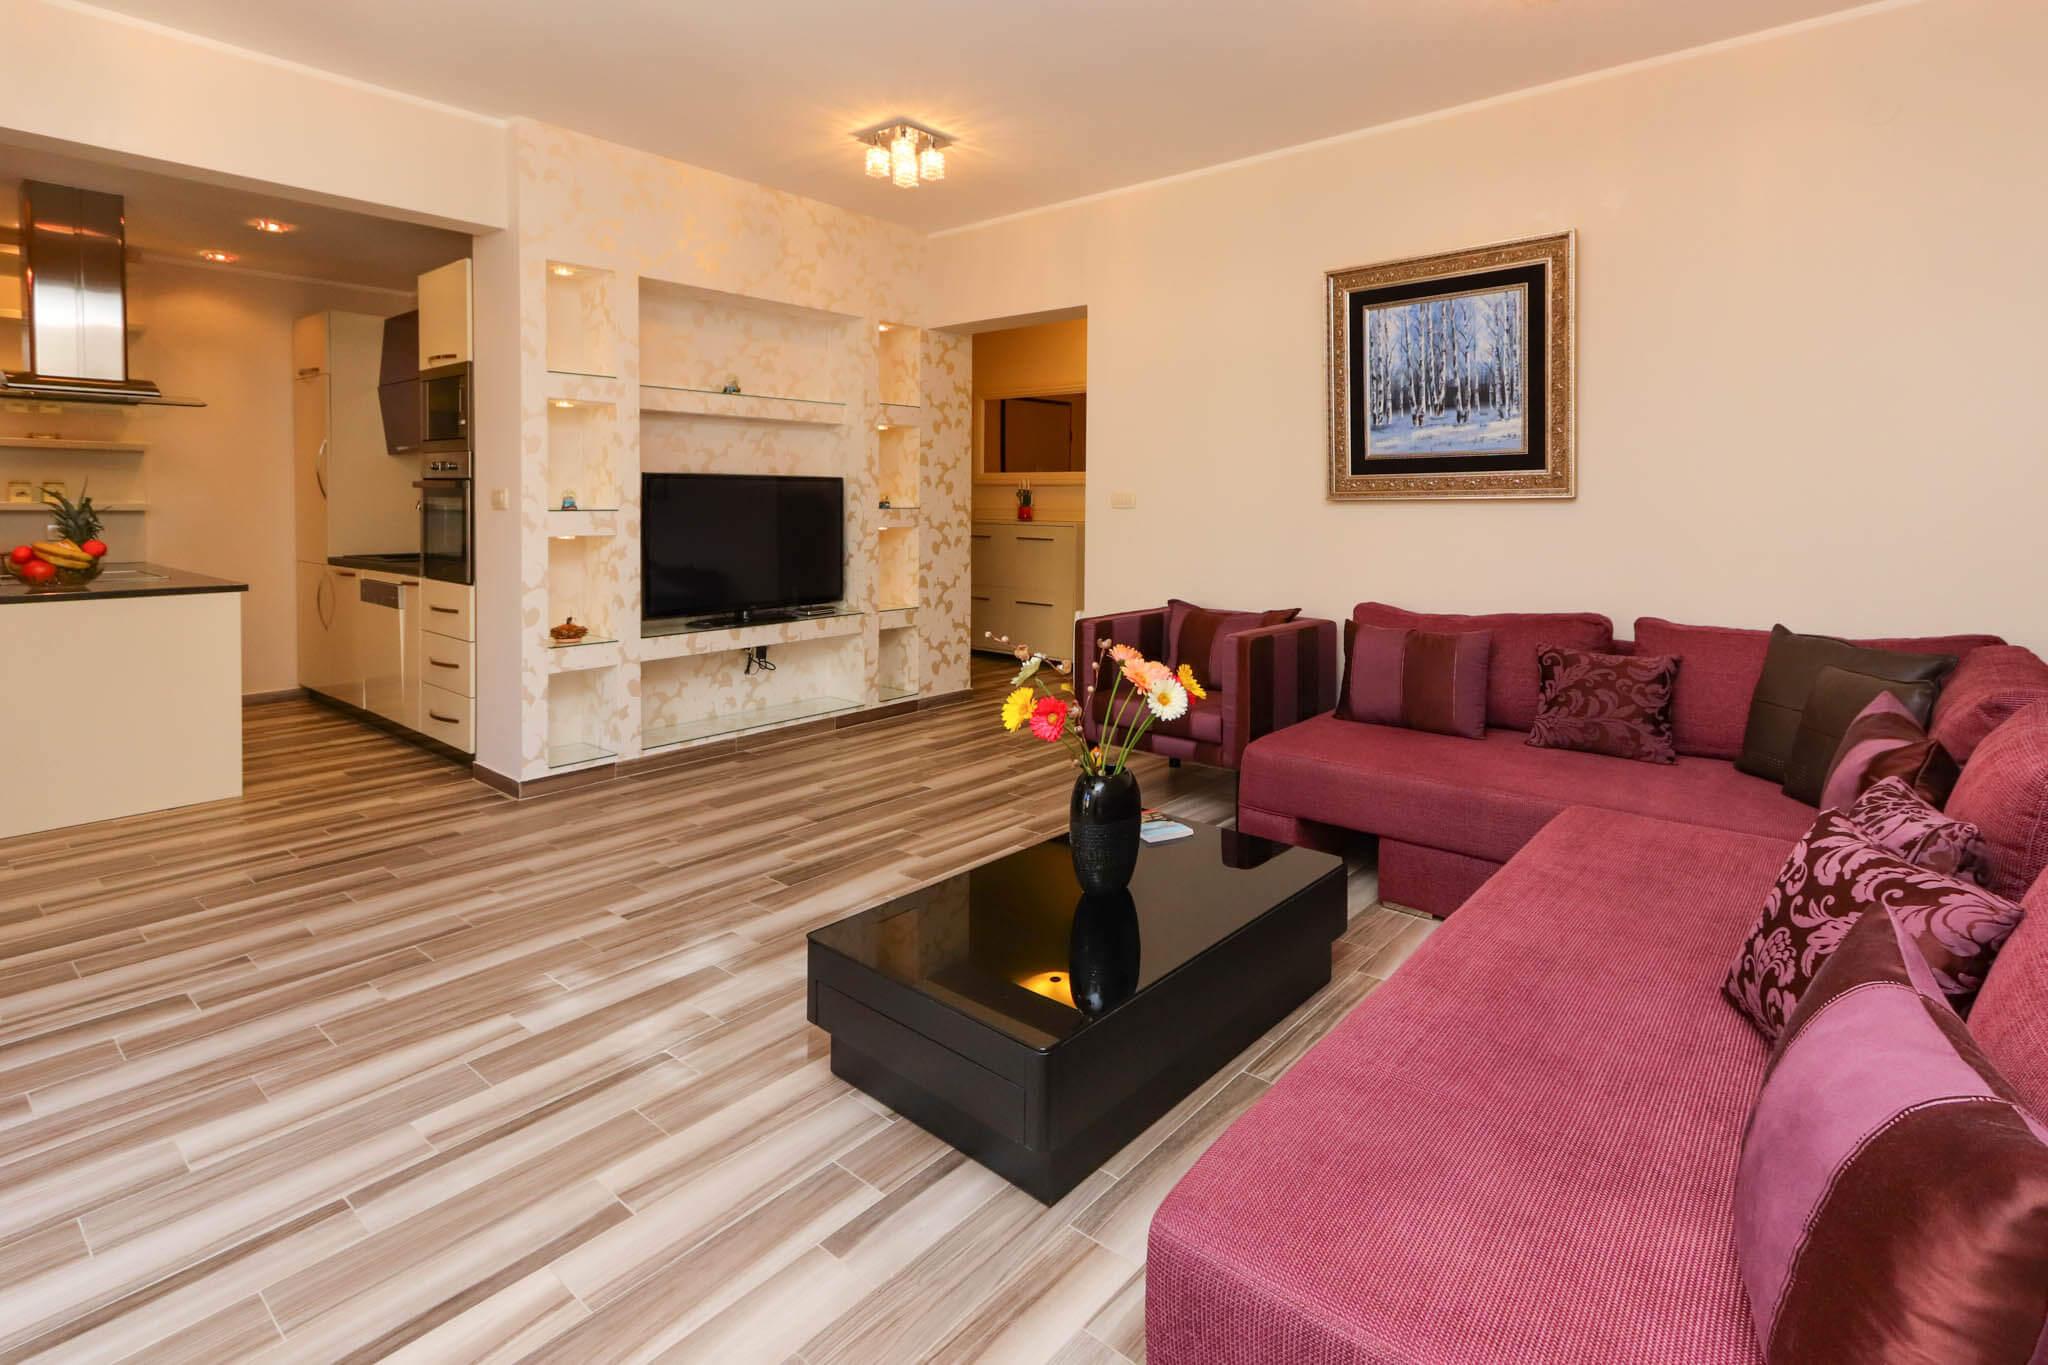 Dvosoban Lux apartman sa garažom - Apartmani Sofija 2